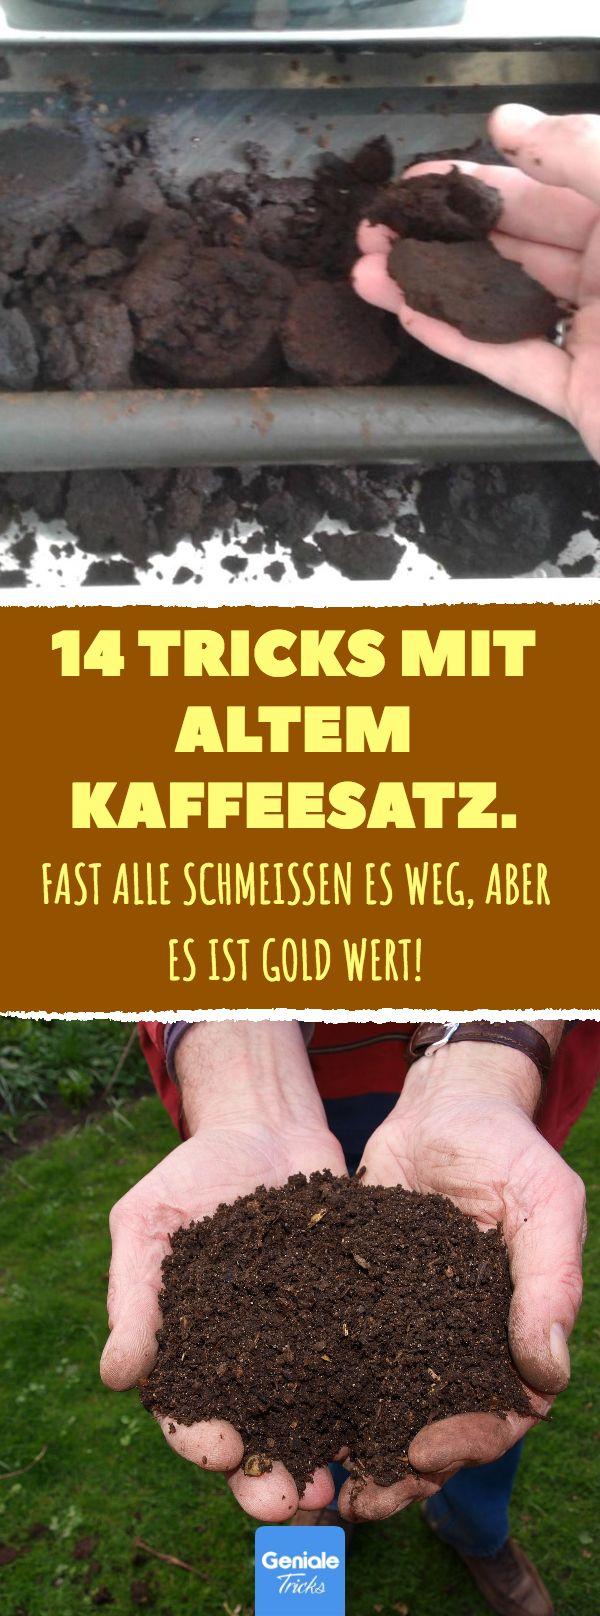 14 Tricks mit altem Kaffeesatz. 14 nützliche Recy…